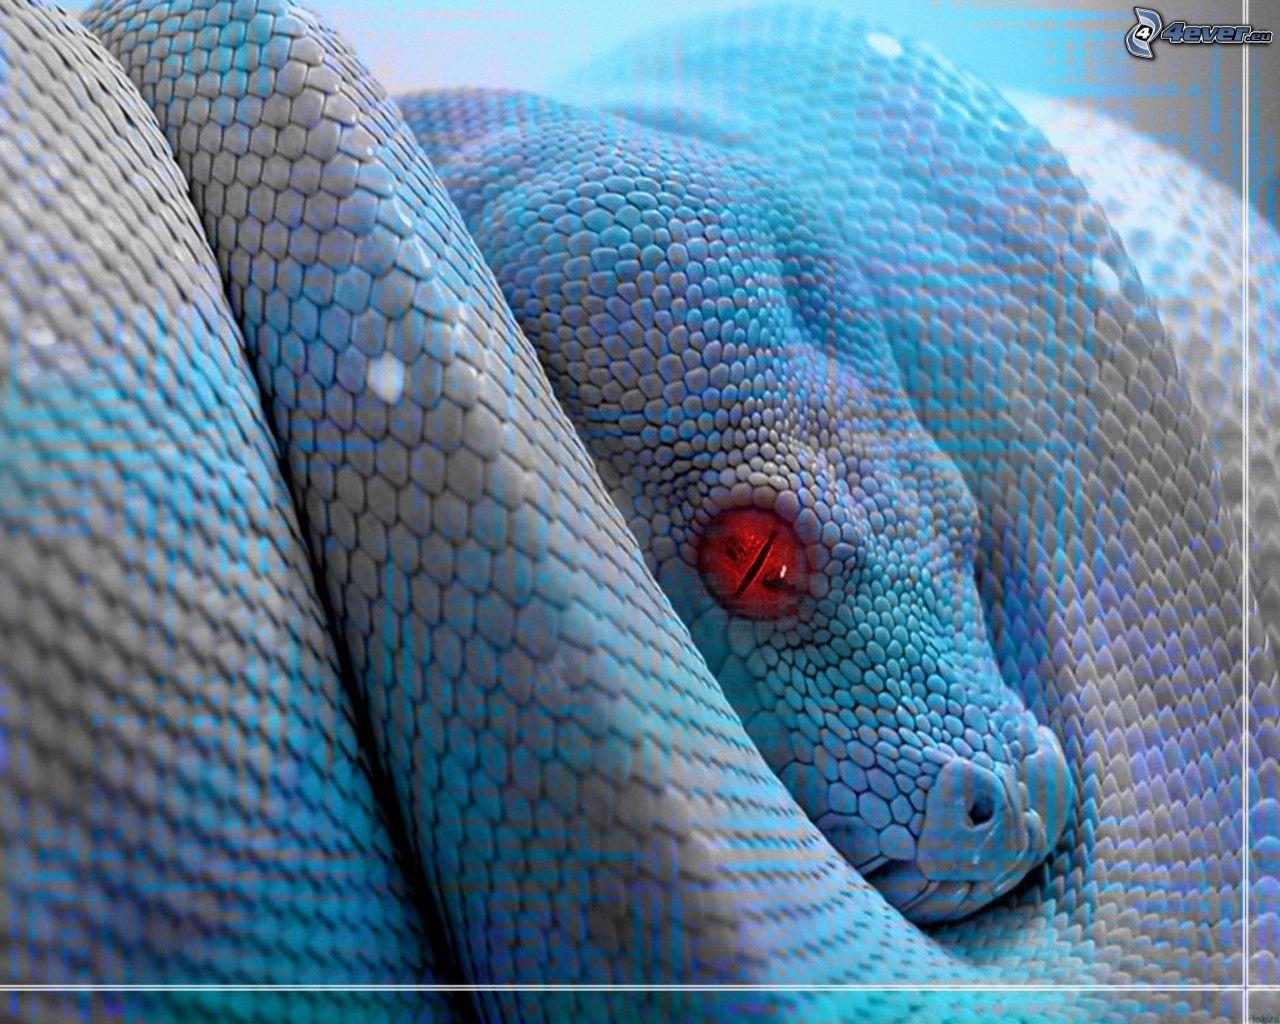 Blaue Schlange